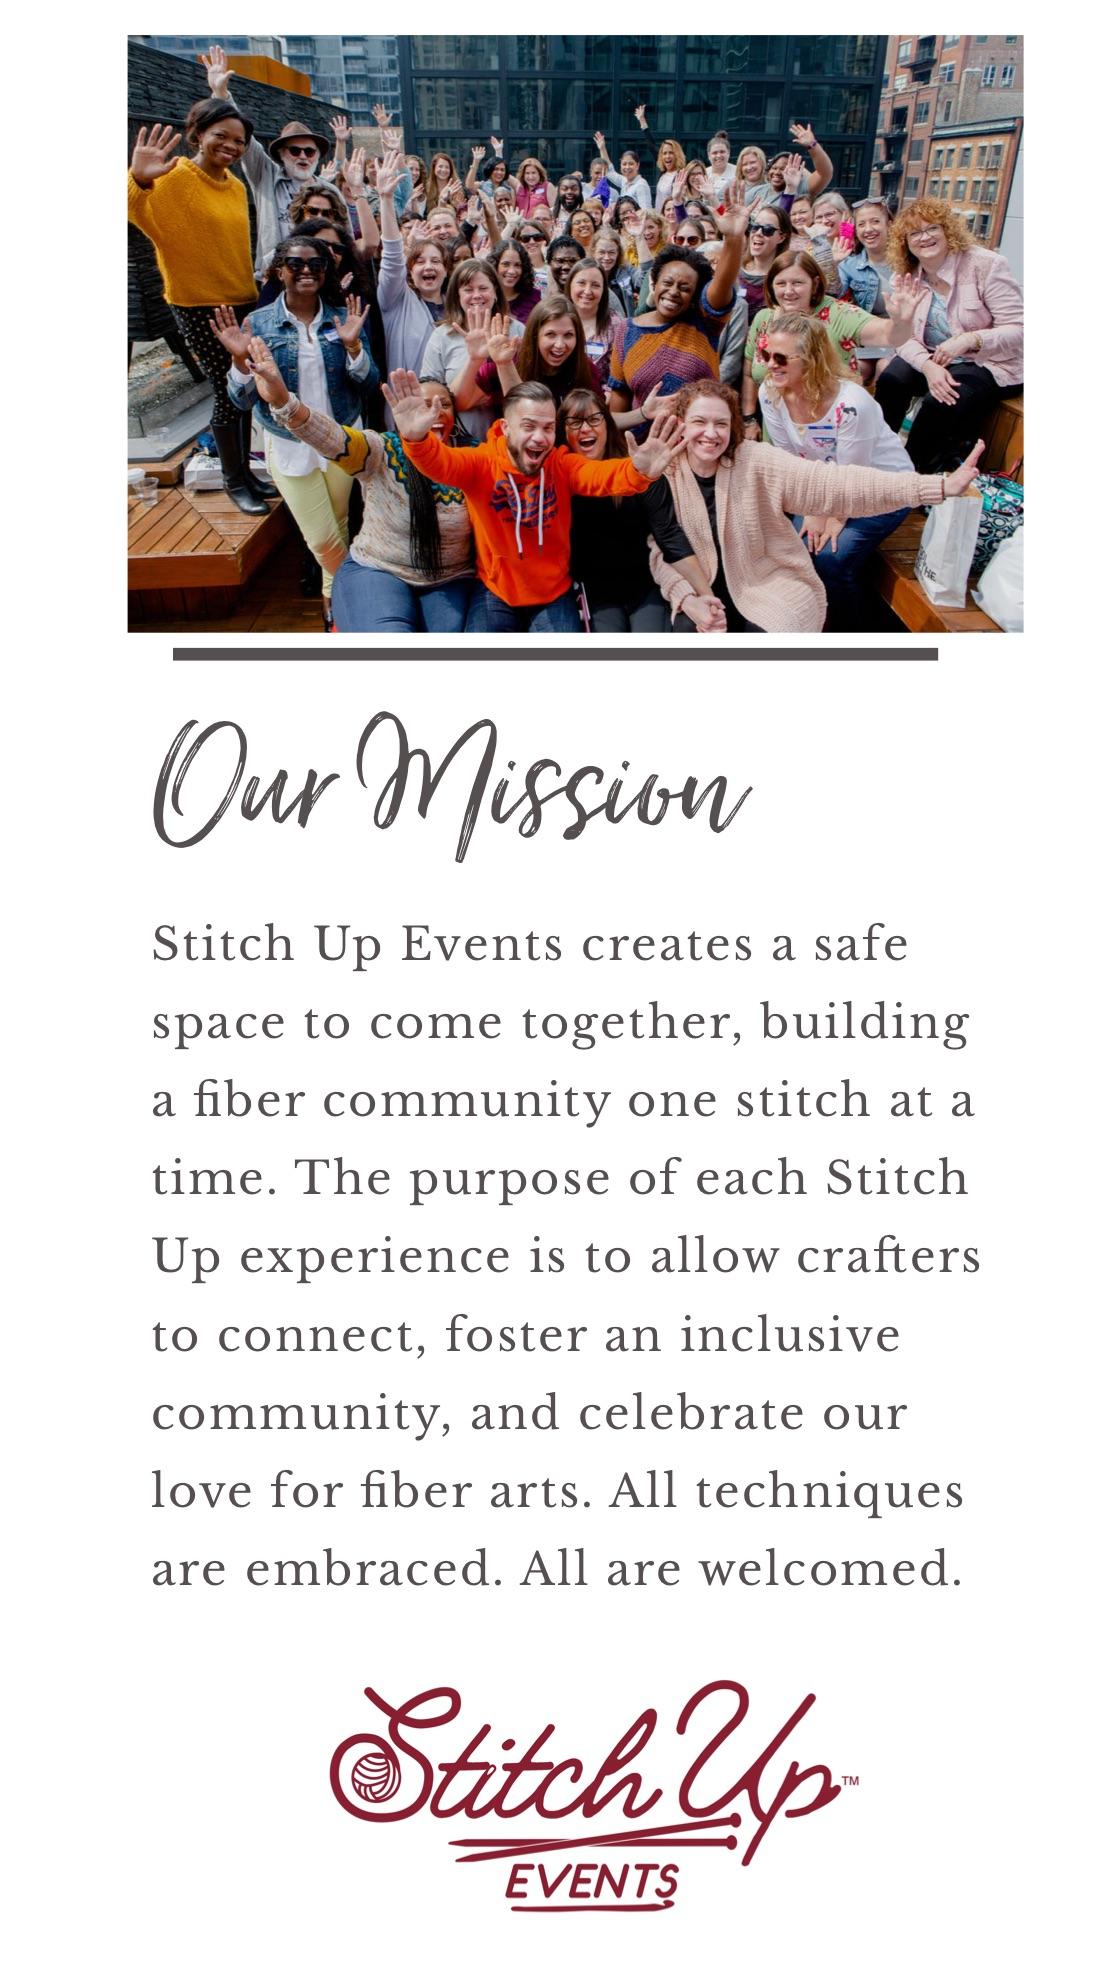 Stitch_Up_Events_Mission_7.jpg